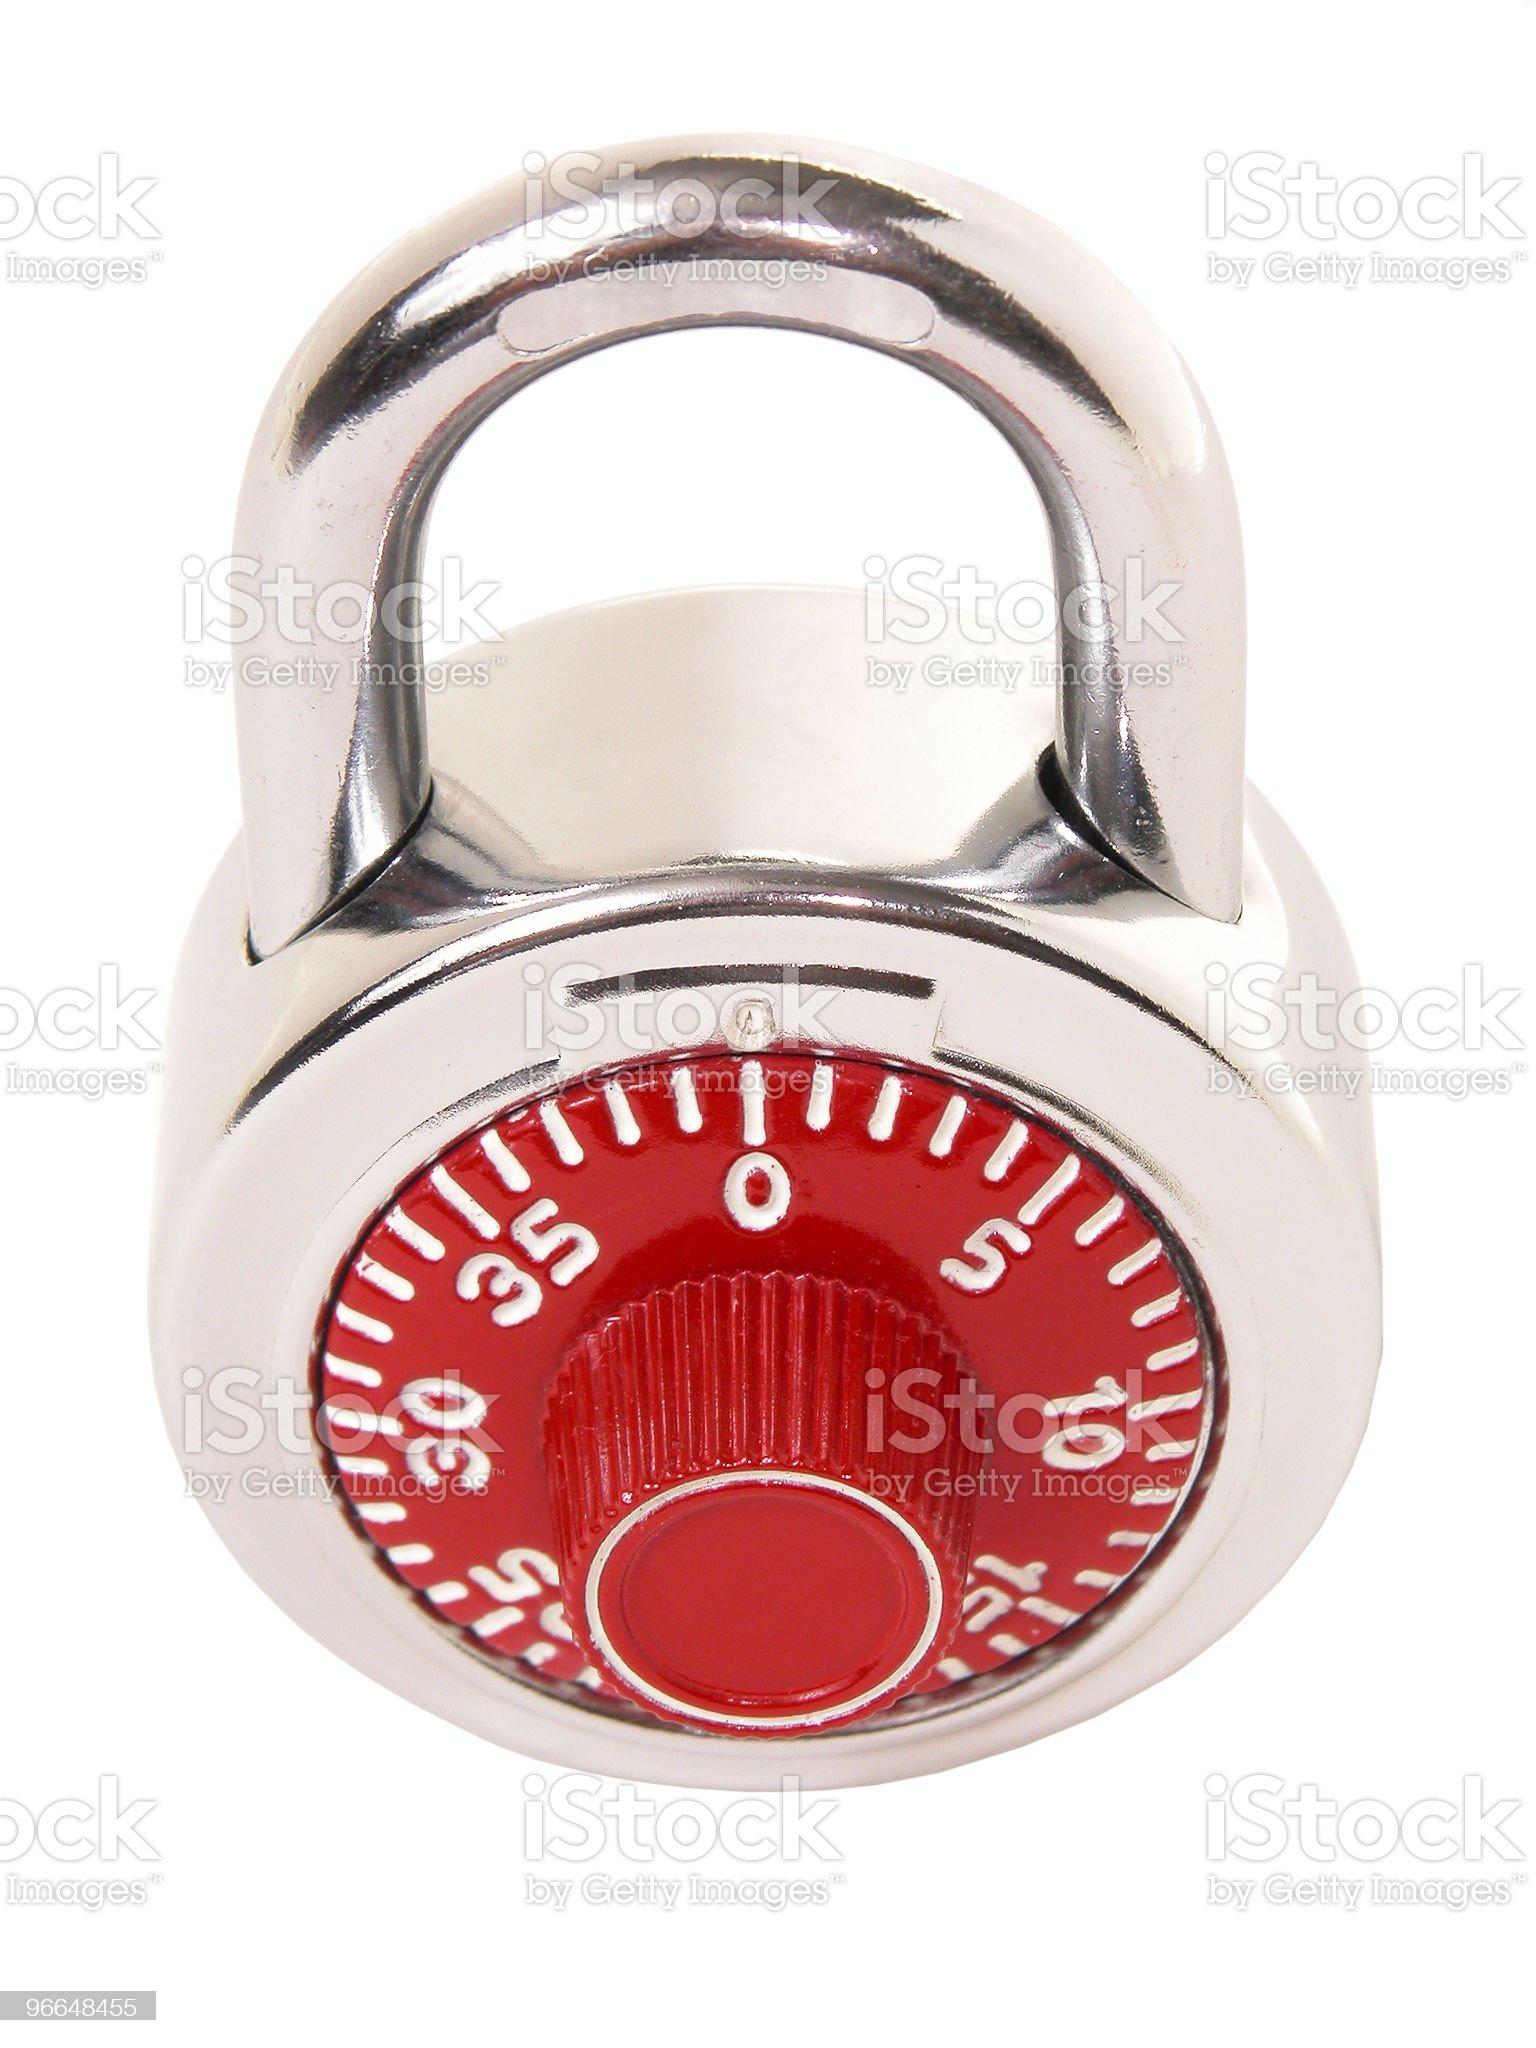 Combination Lock on White royalty-free stock photo